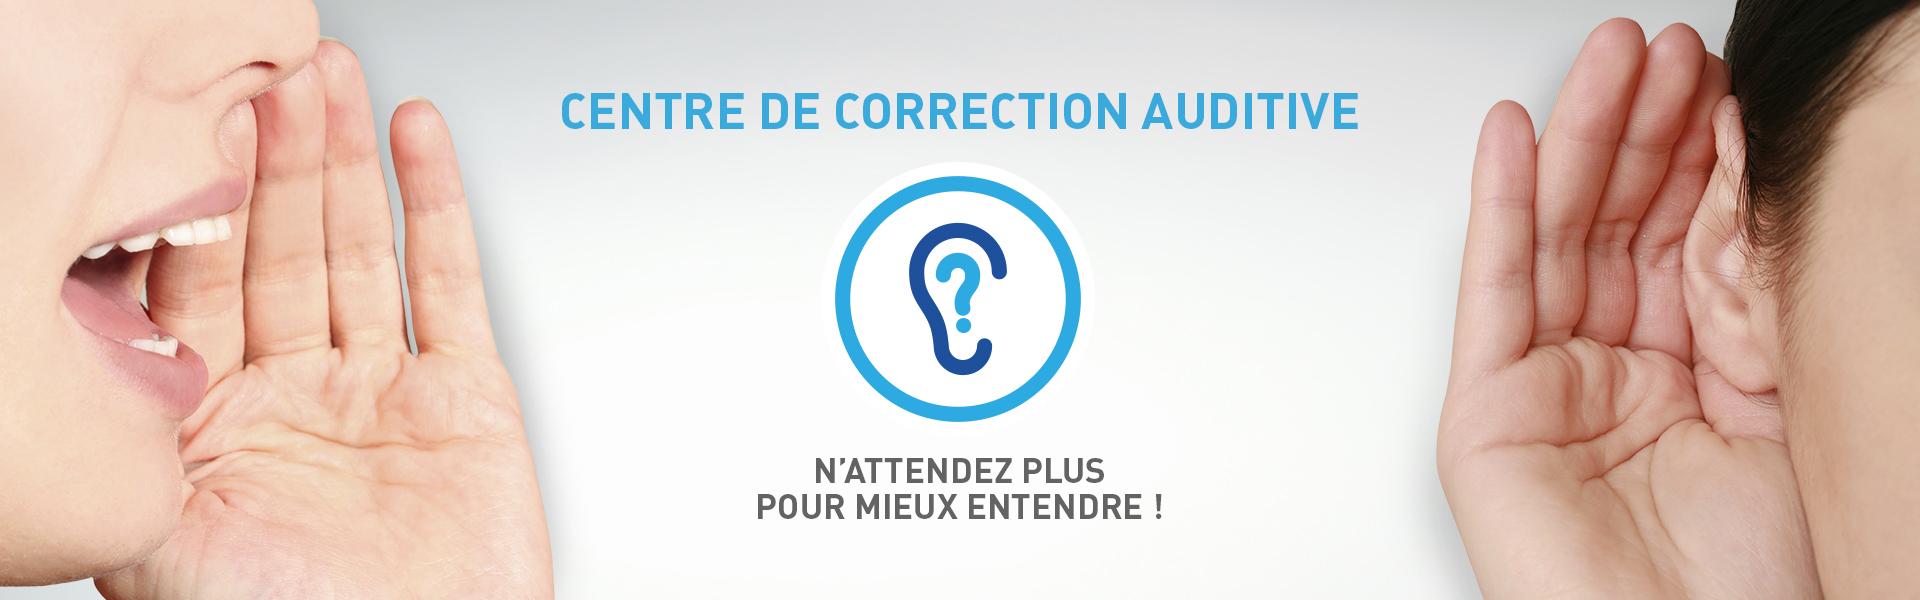 AuditionChaudiron-home-02